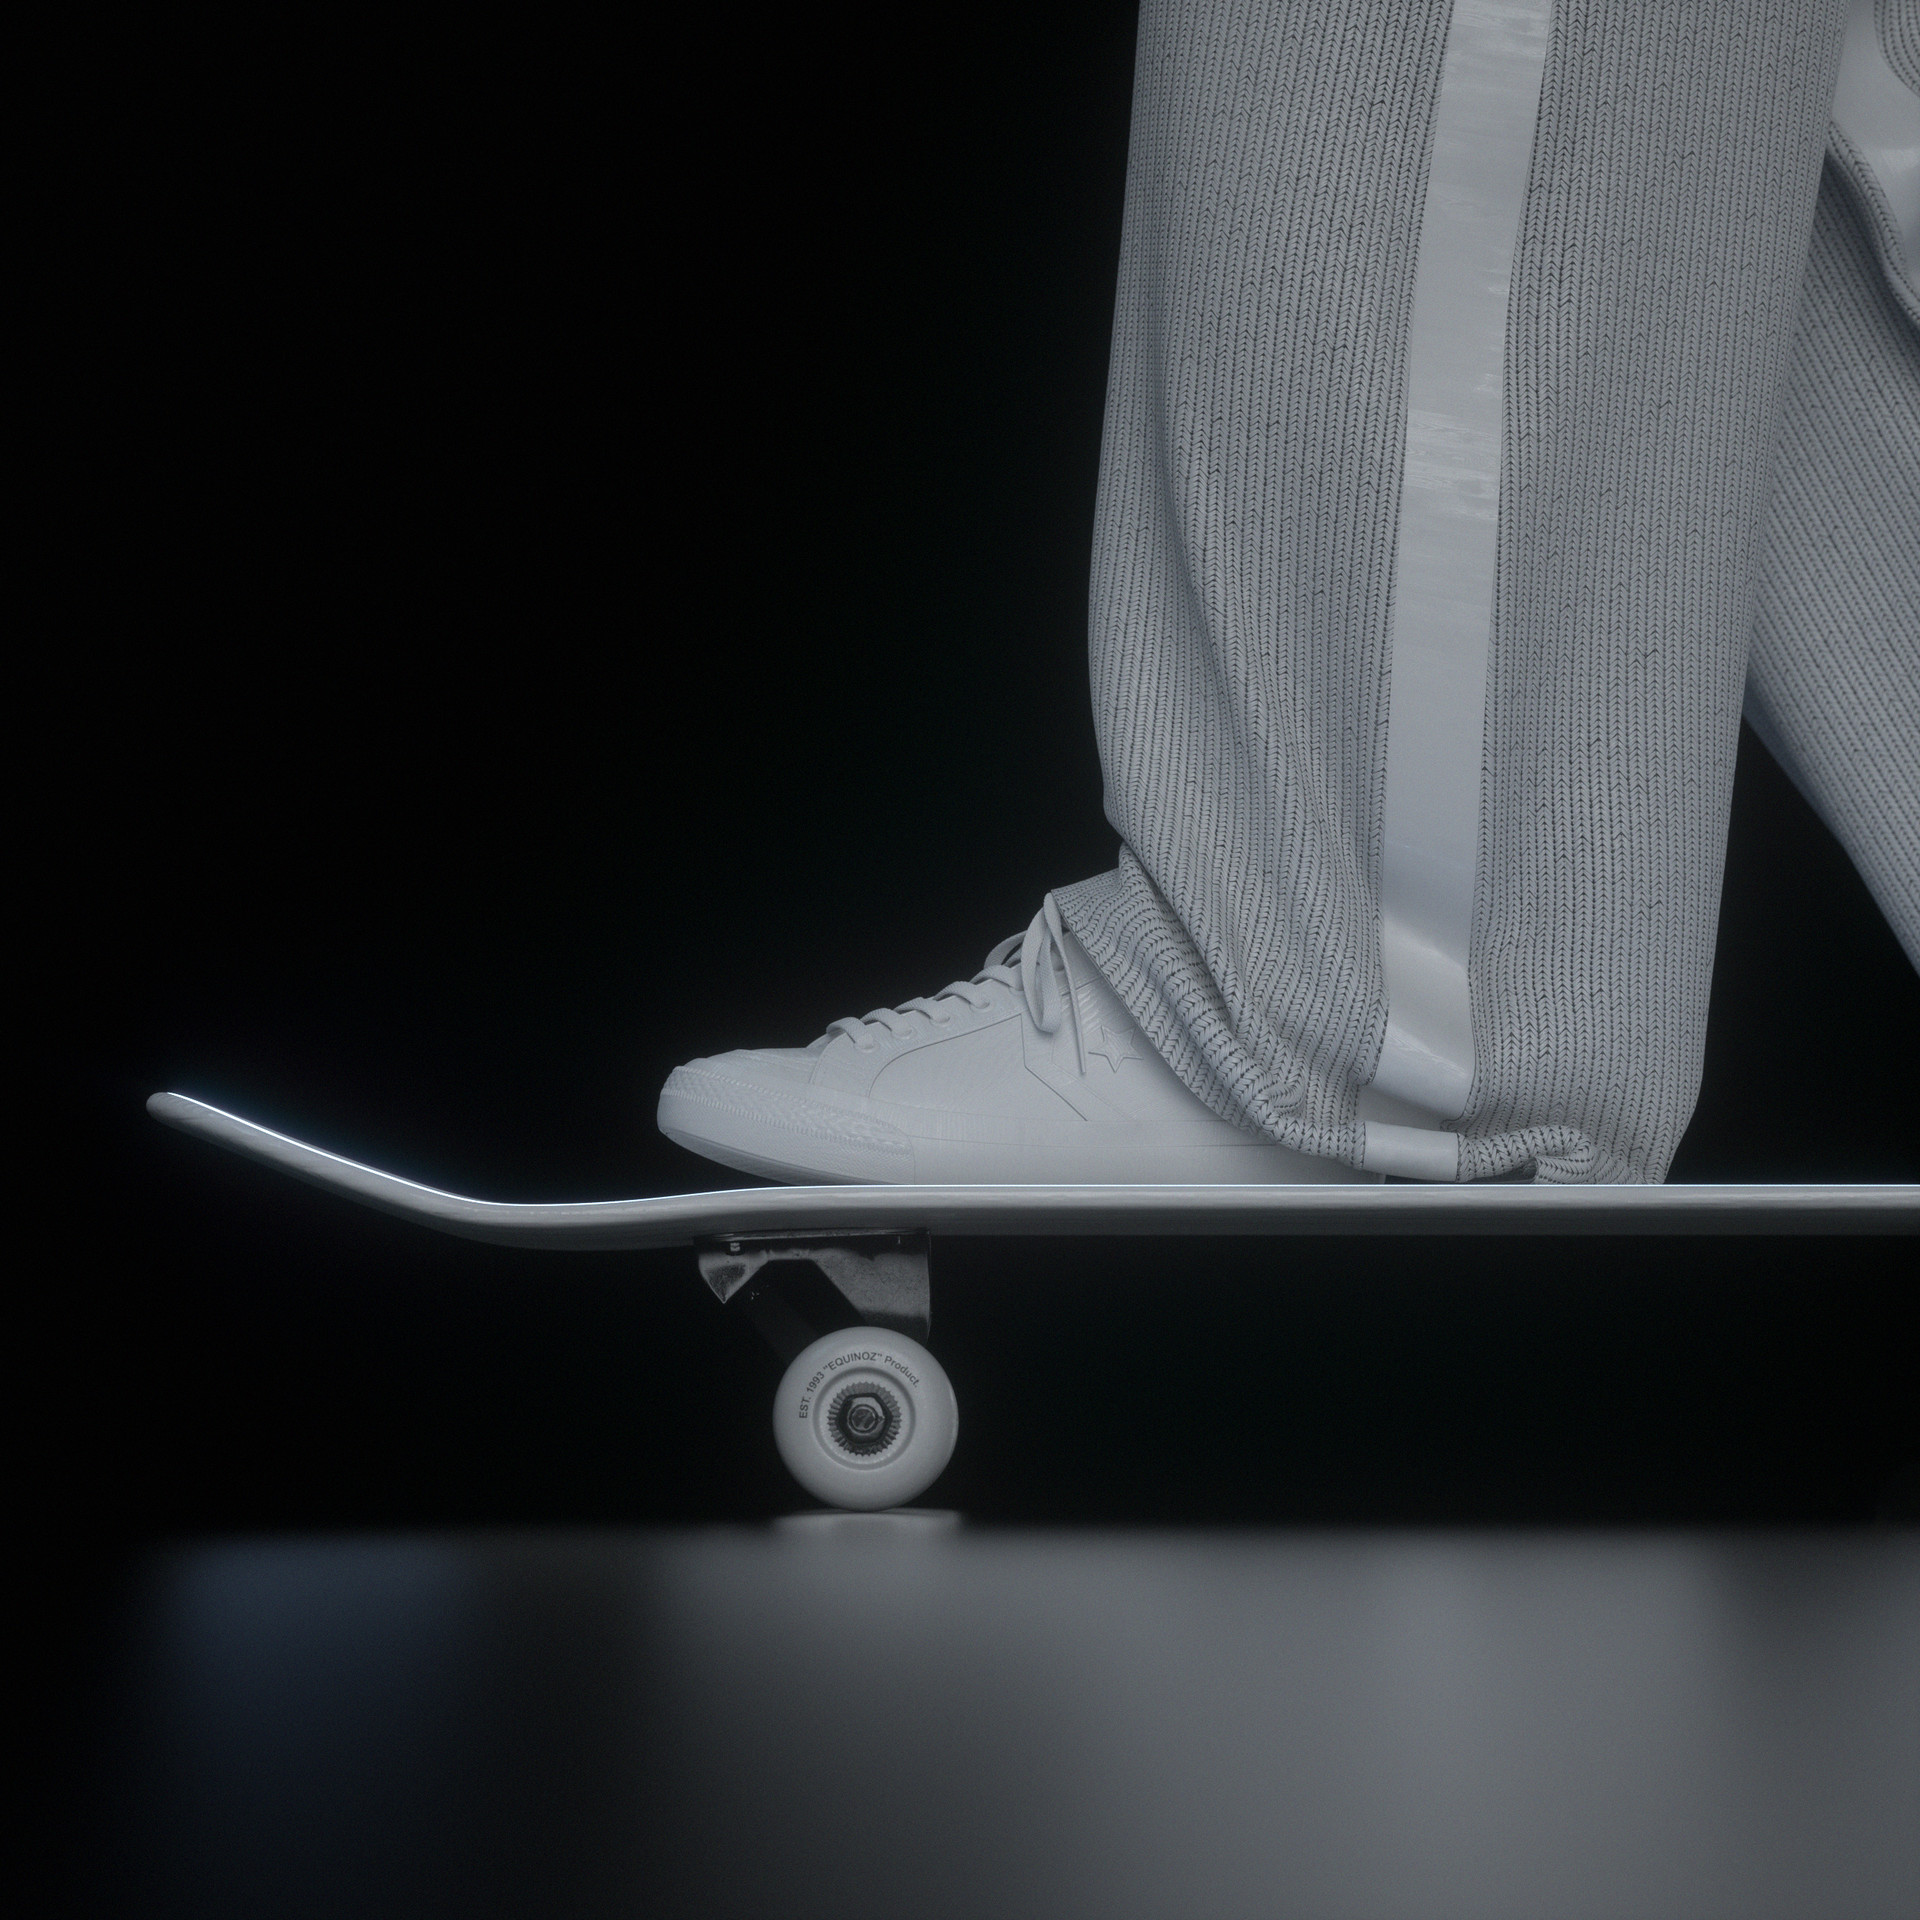 Mark chang skateboard3